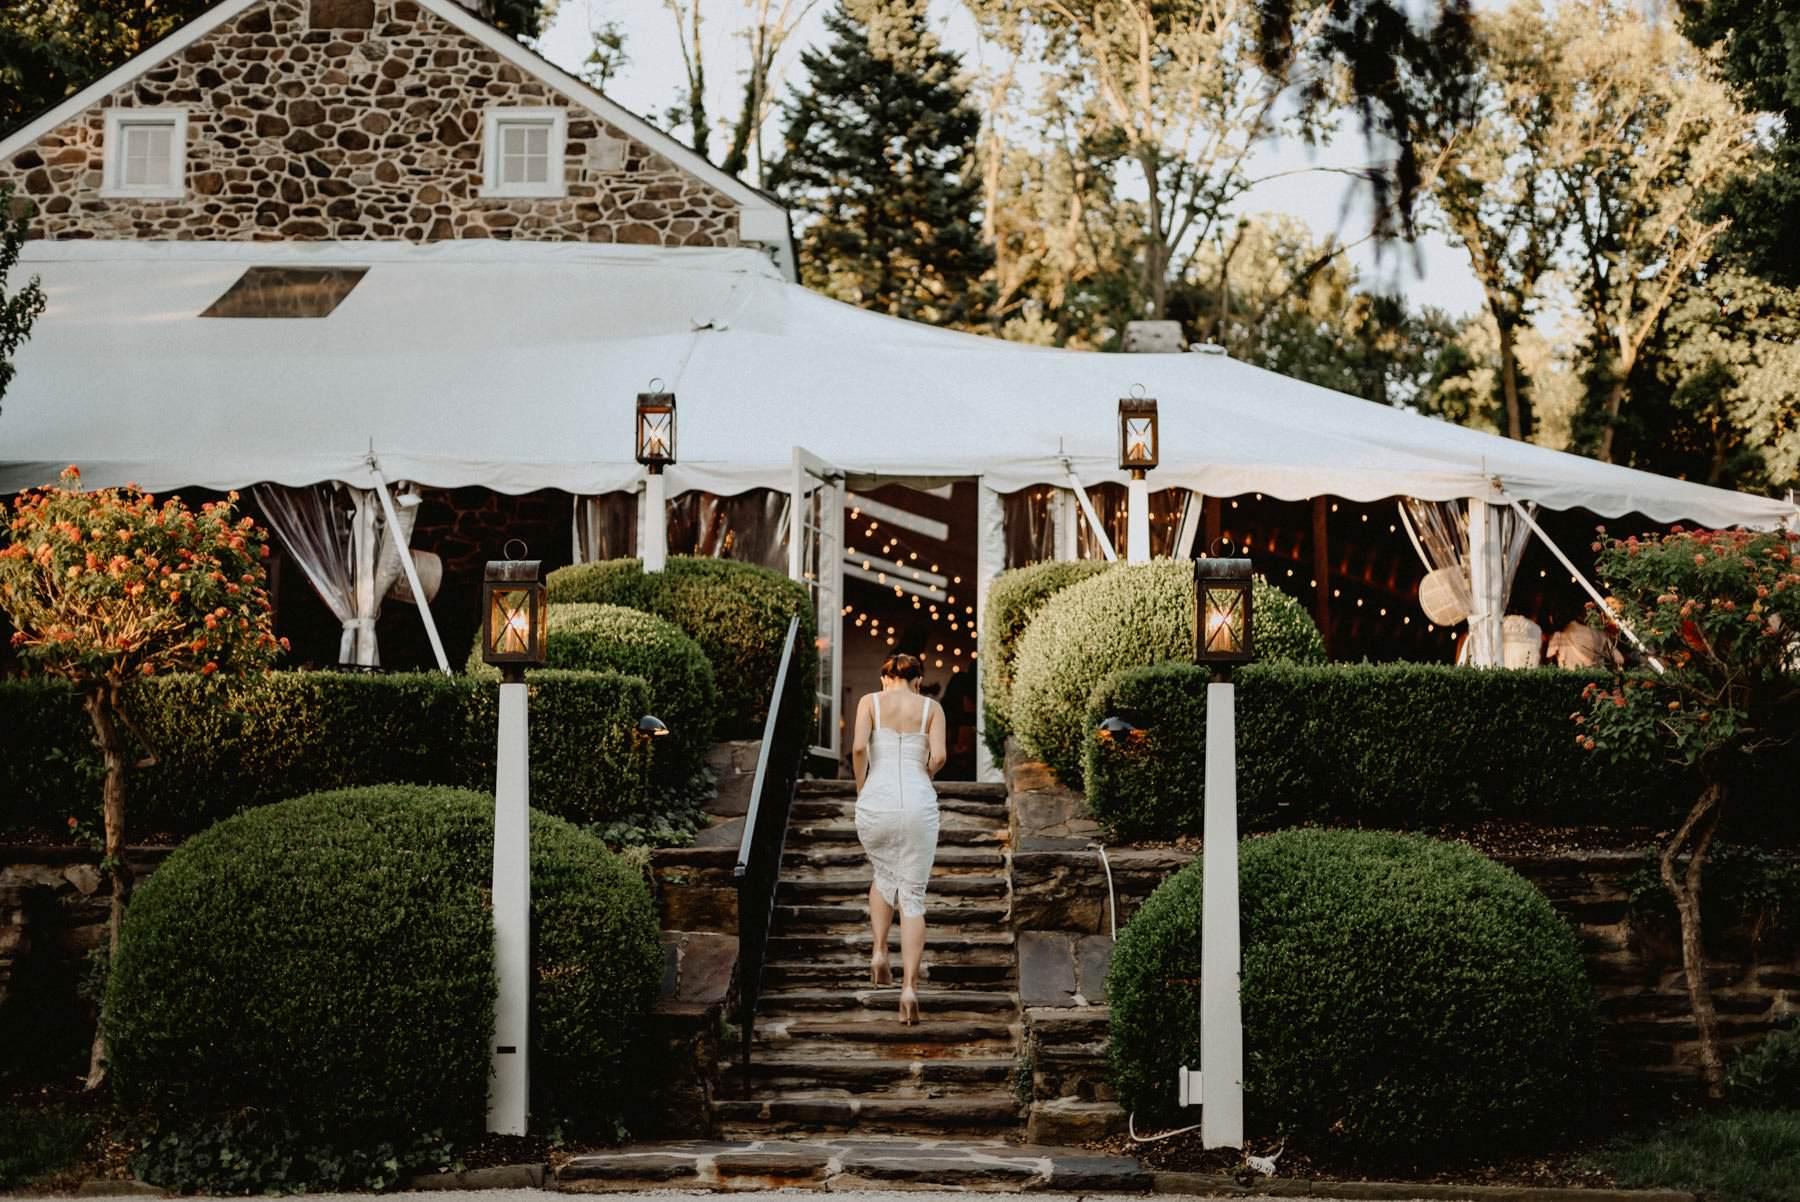 Appleford-estate-wedding-141.jpg